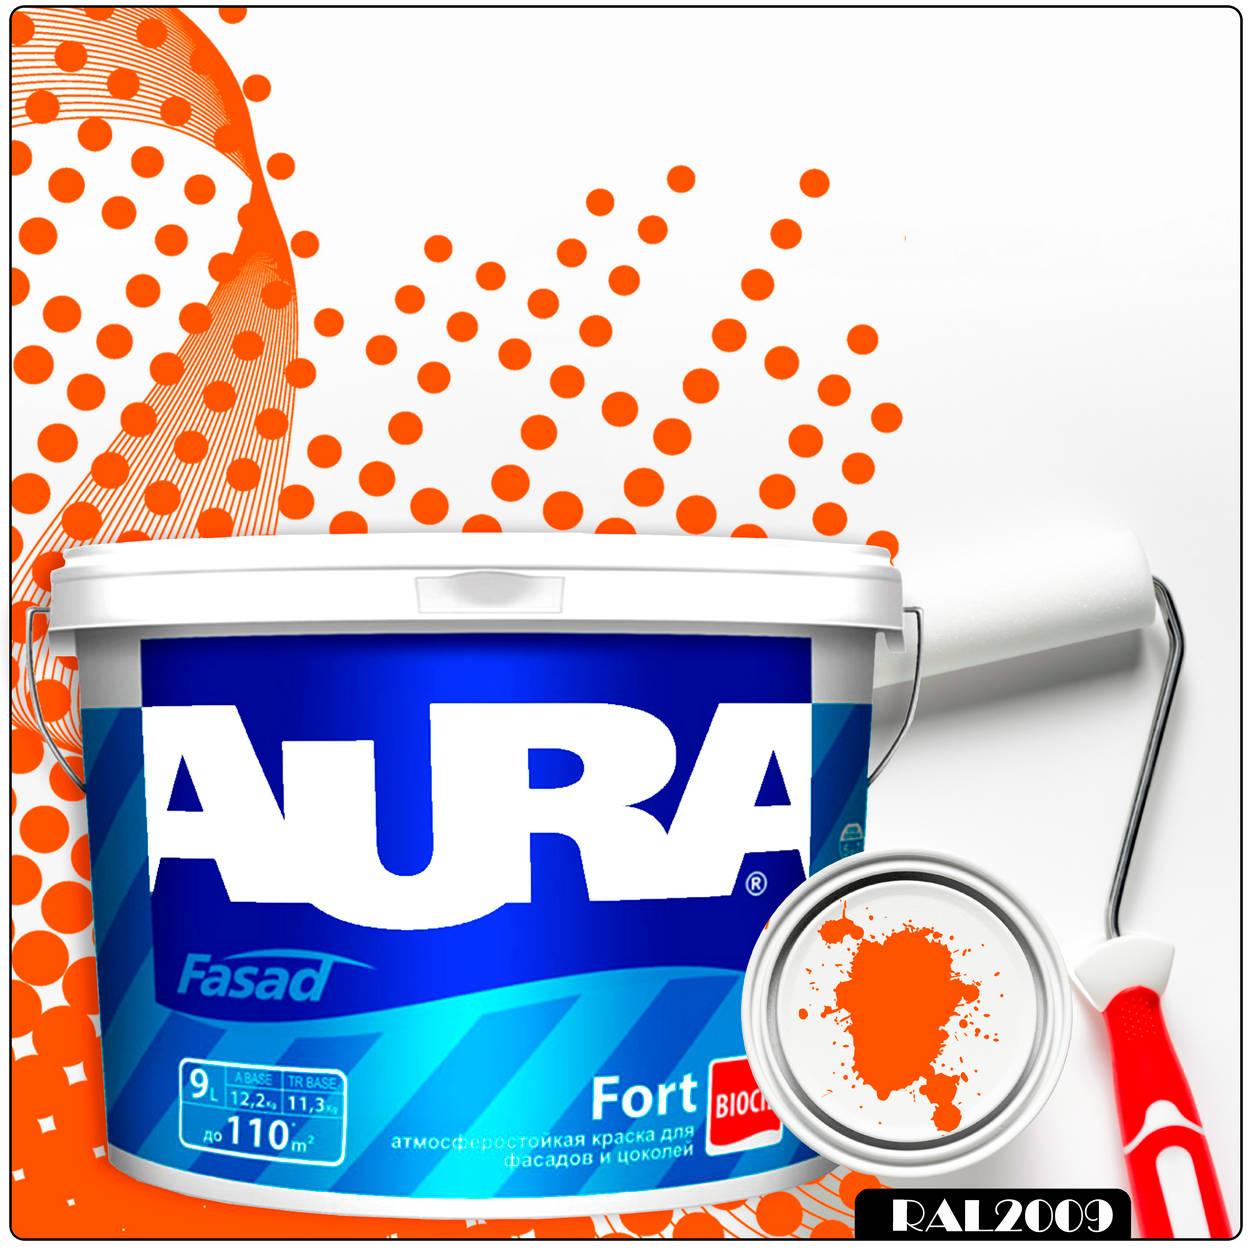 Фото 7 - Краска Aura Fasad Fort, RAL 2009 Транспортный-оранжевый, латексная, матовая, для фасада и цоколей, 9л, Аура.